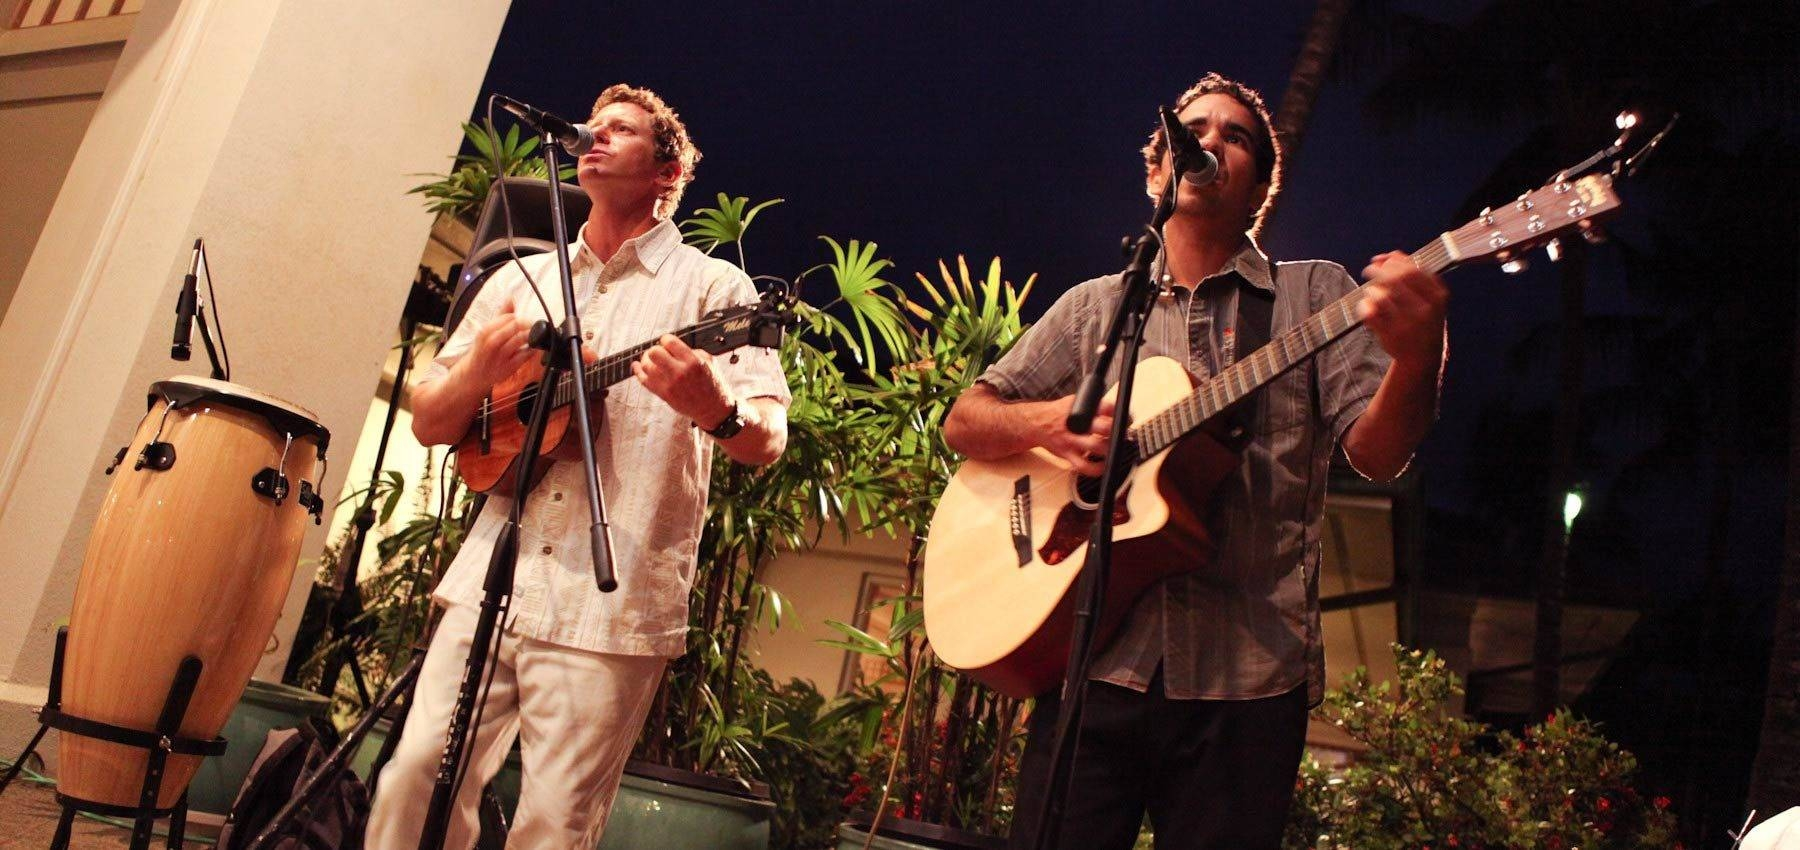 Maui Musicians – Barefoot Minded | Maui Wedding Musicians Pertaining To Current Maui Wedding Bands (View 4 of 15)